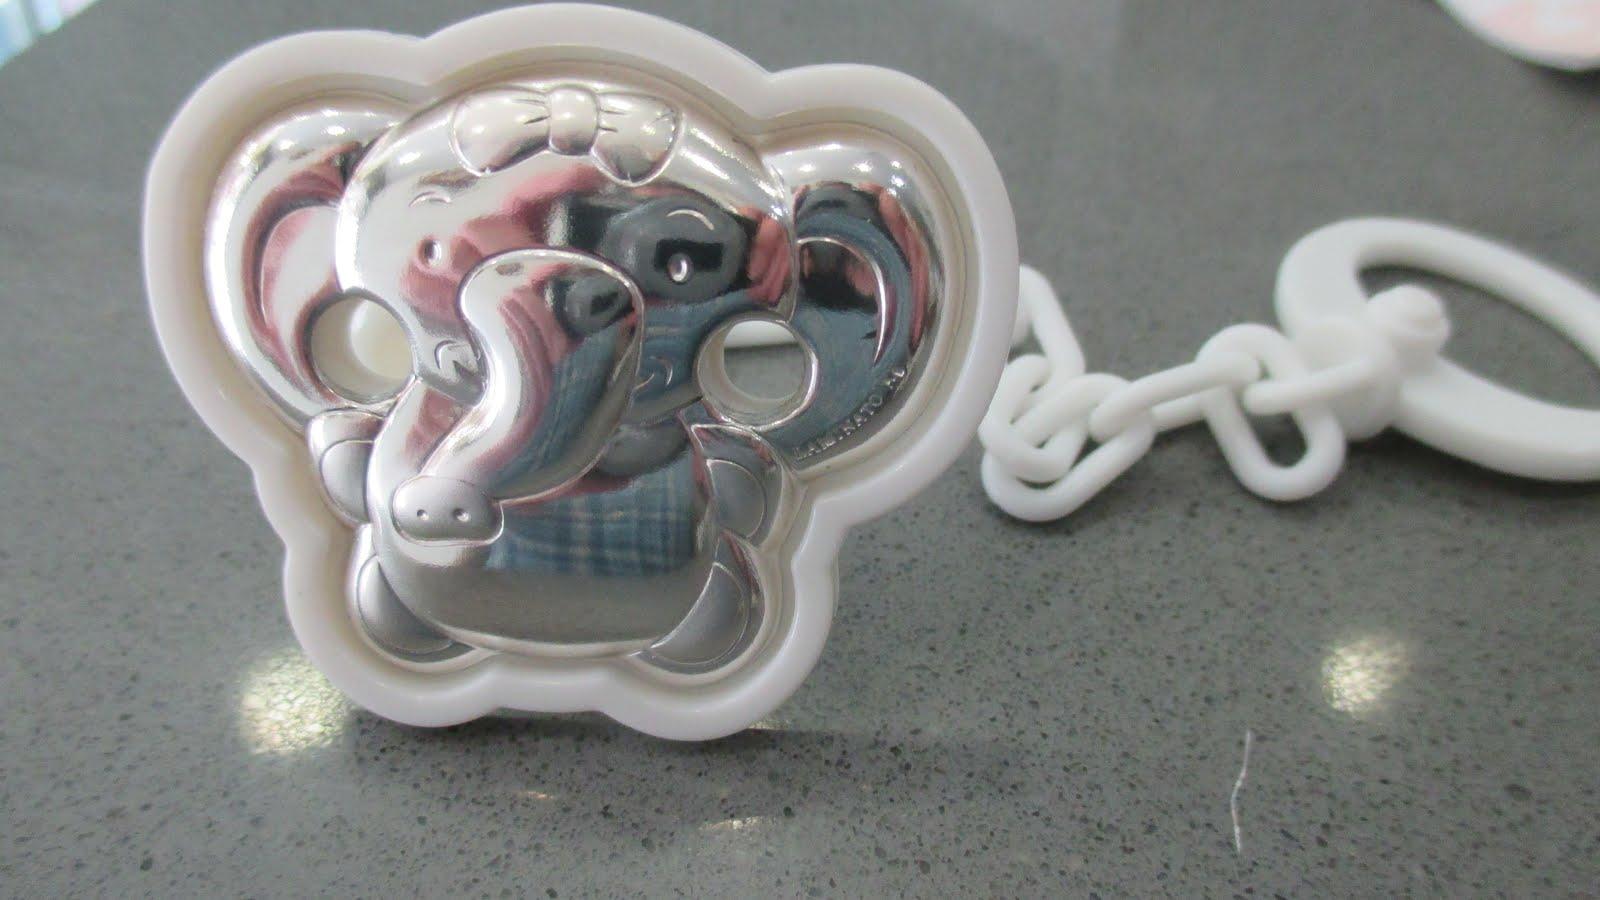 Chupetero de plata, elefante